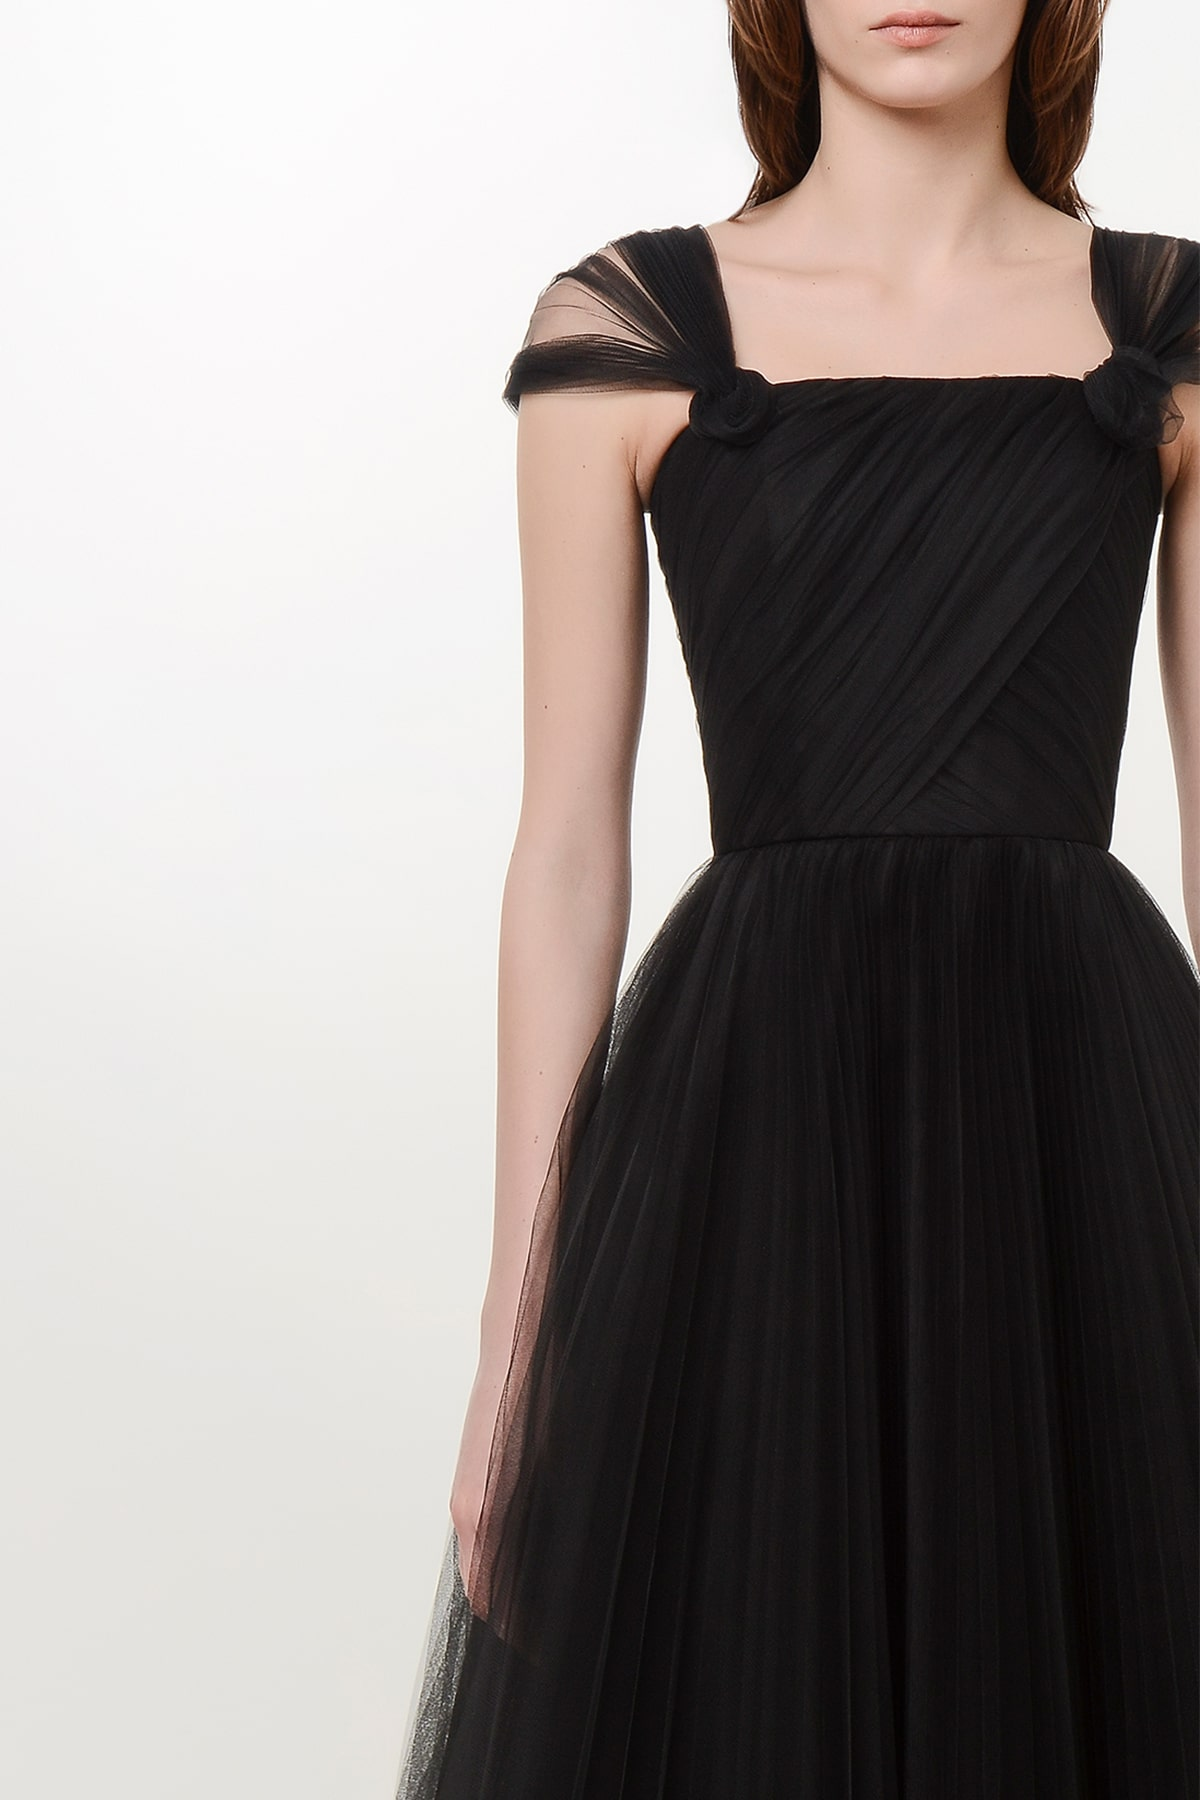 Corset style tulle dress 3